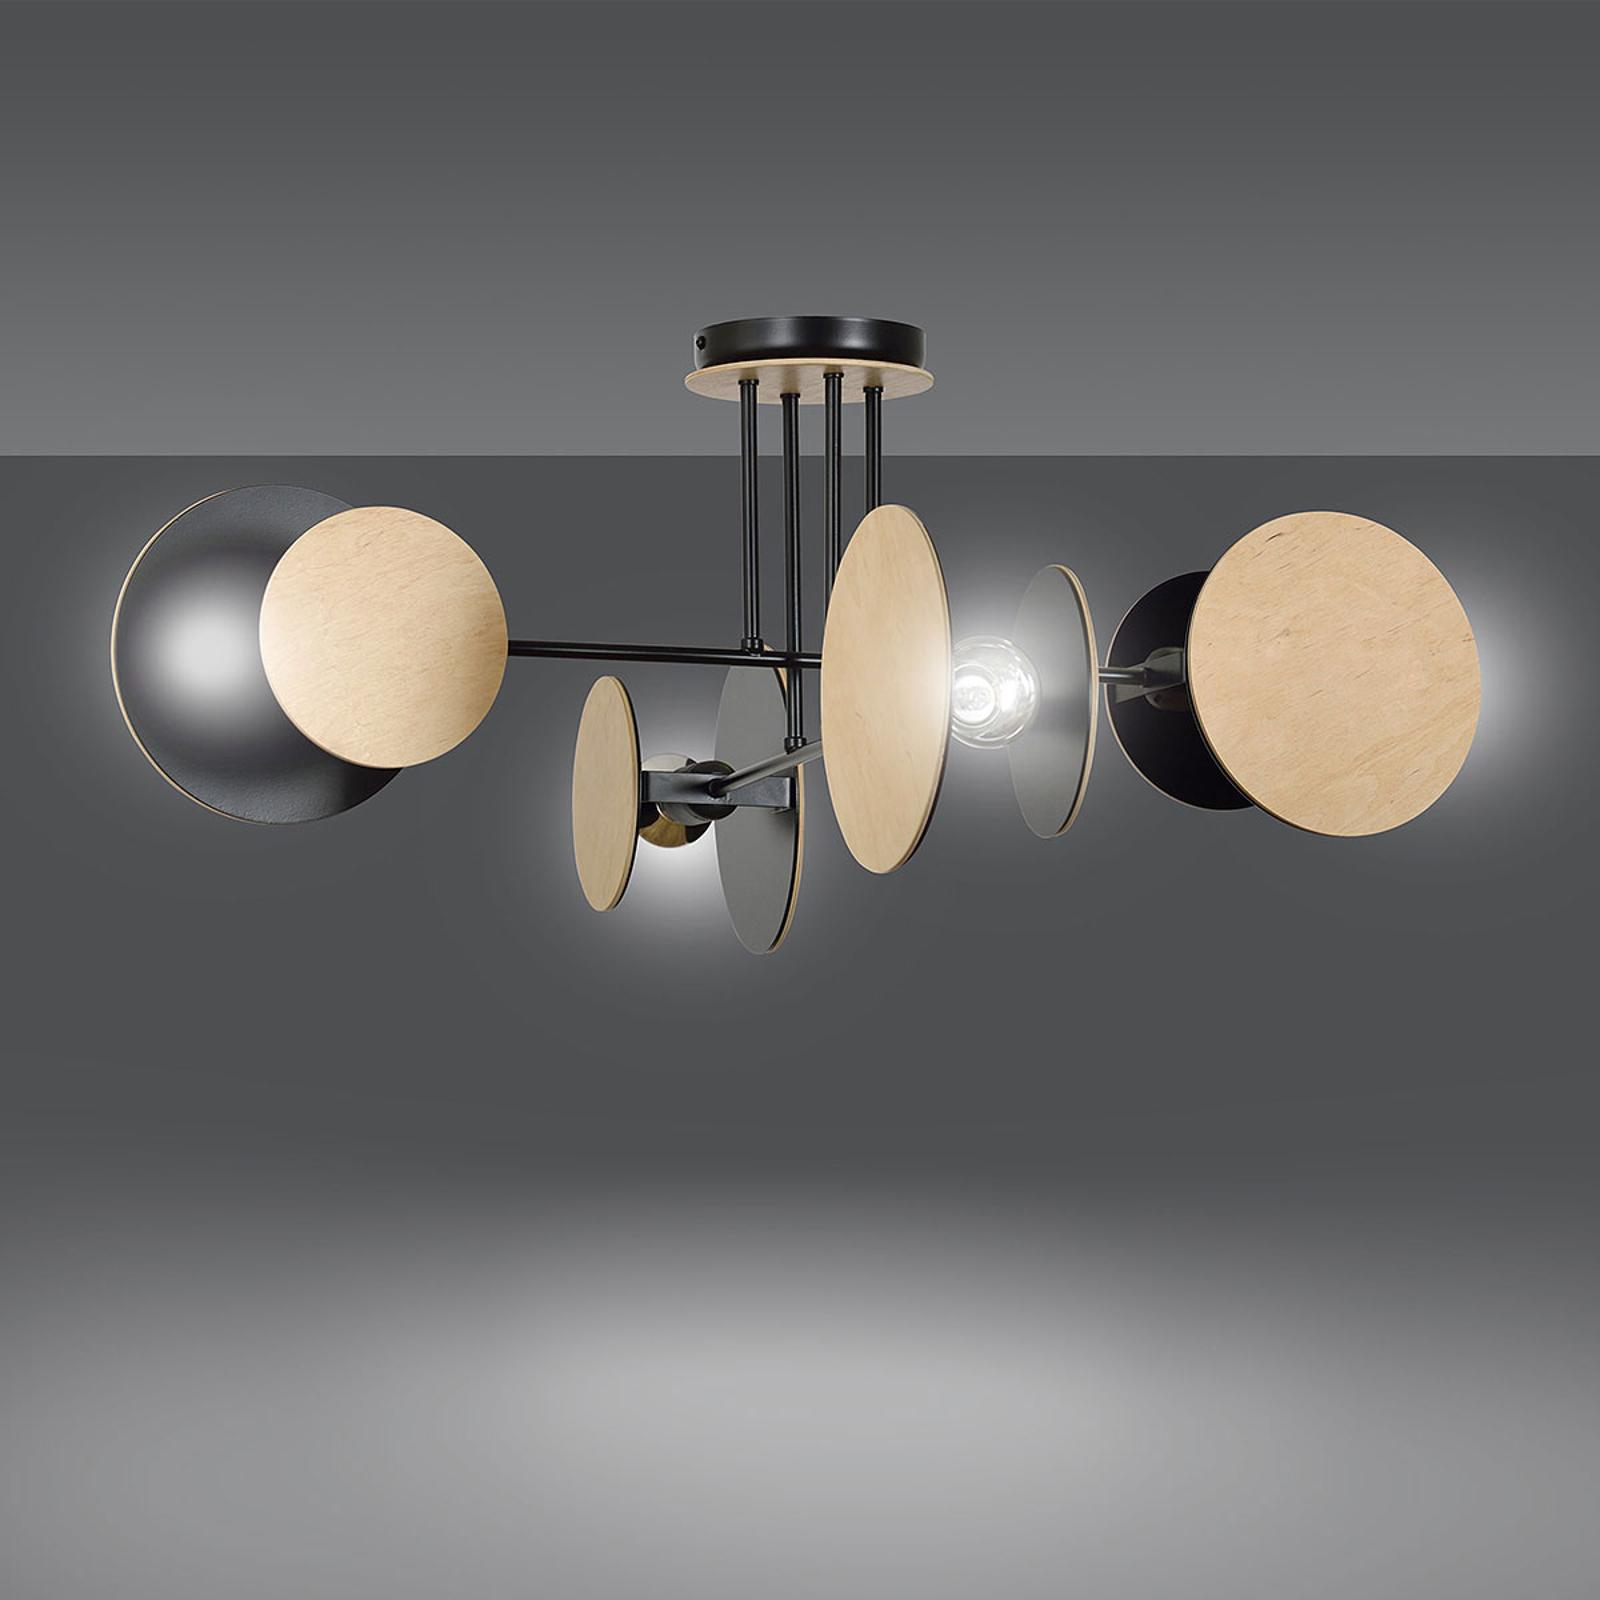 Plafondlamp Zita 4 in zwart met houtdecor